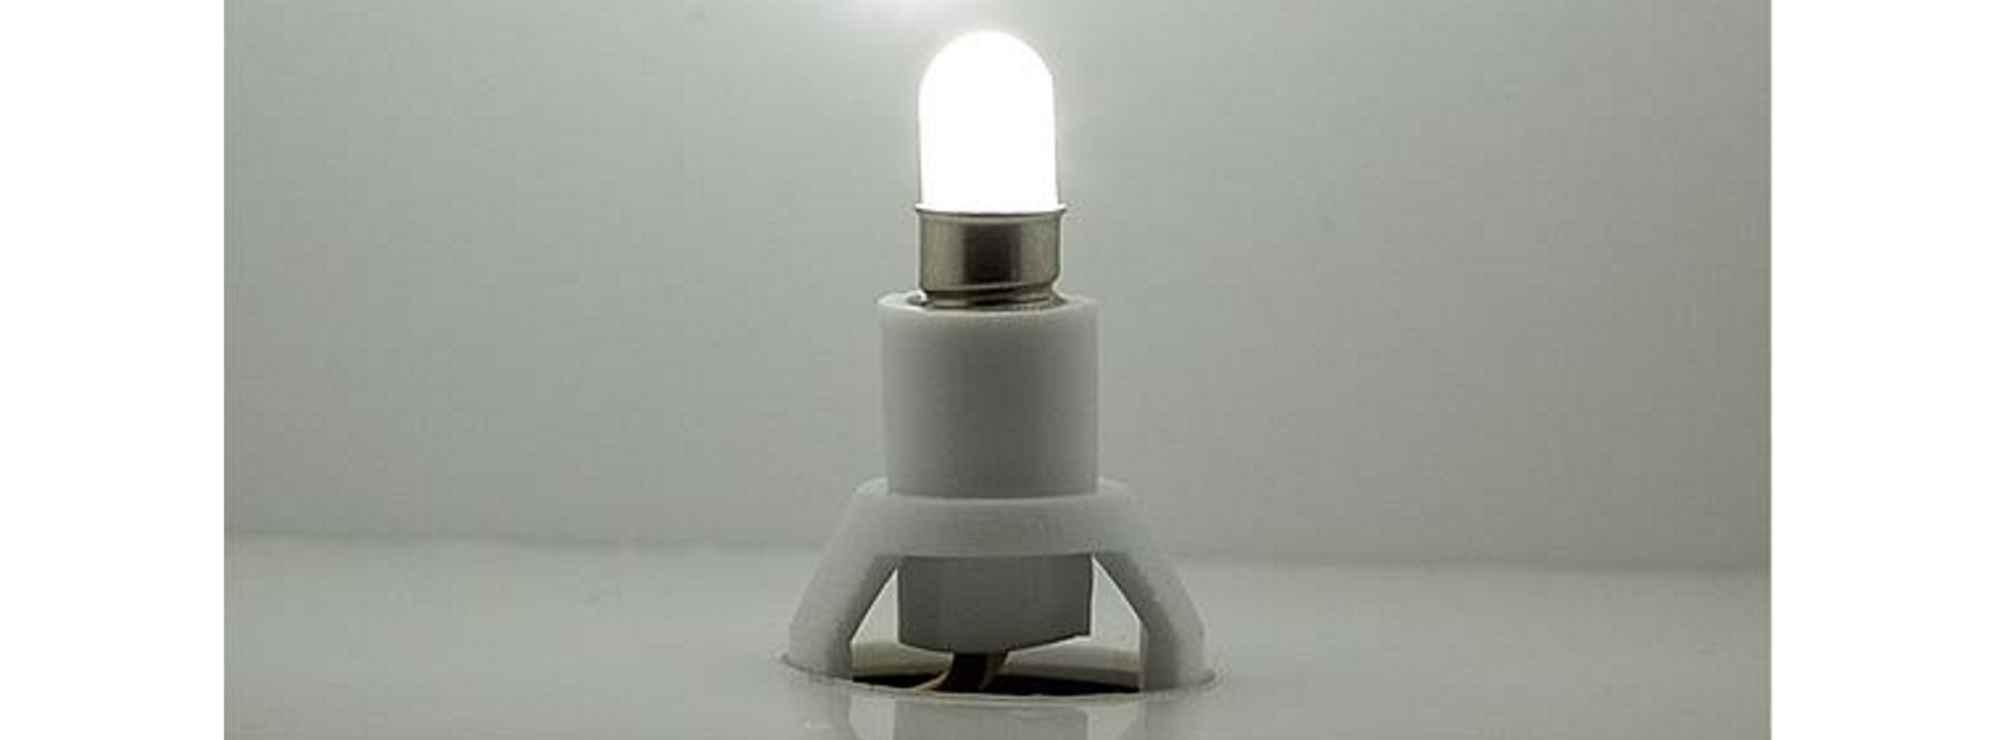 Faller 180661 Beleuchtungssockel Led Spur H0 Tt N Z Online Kaufen Bei Modellbau Hartle